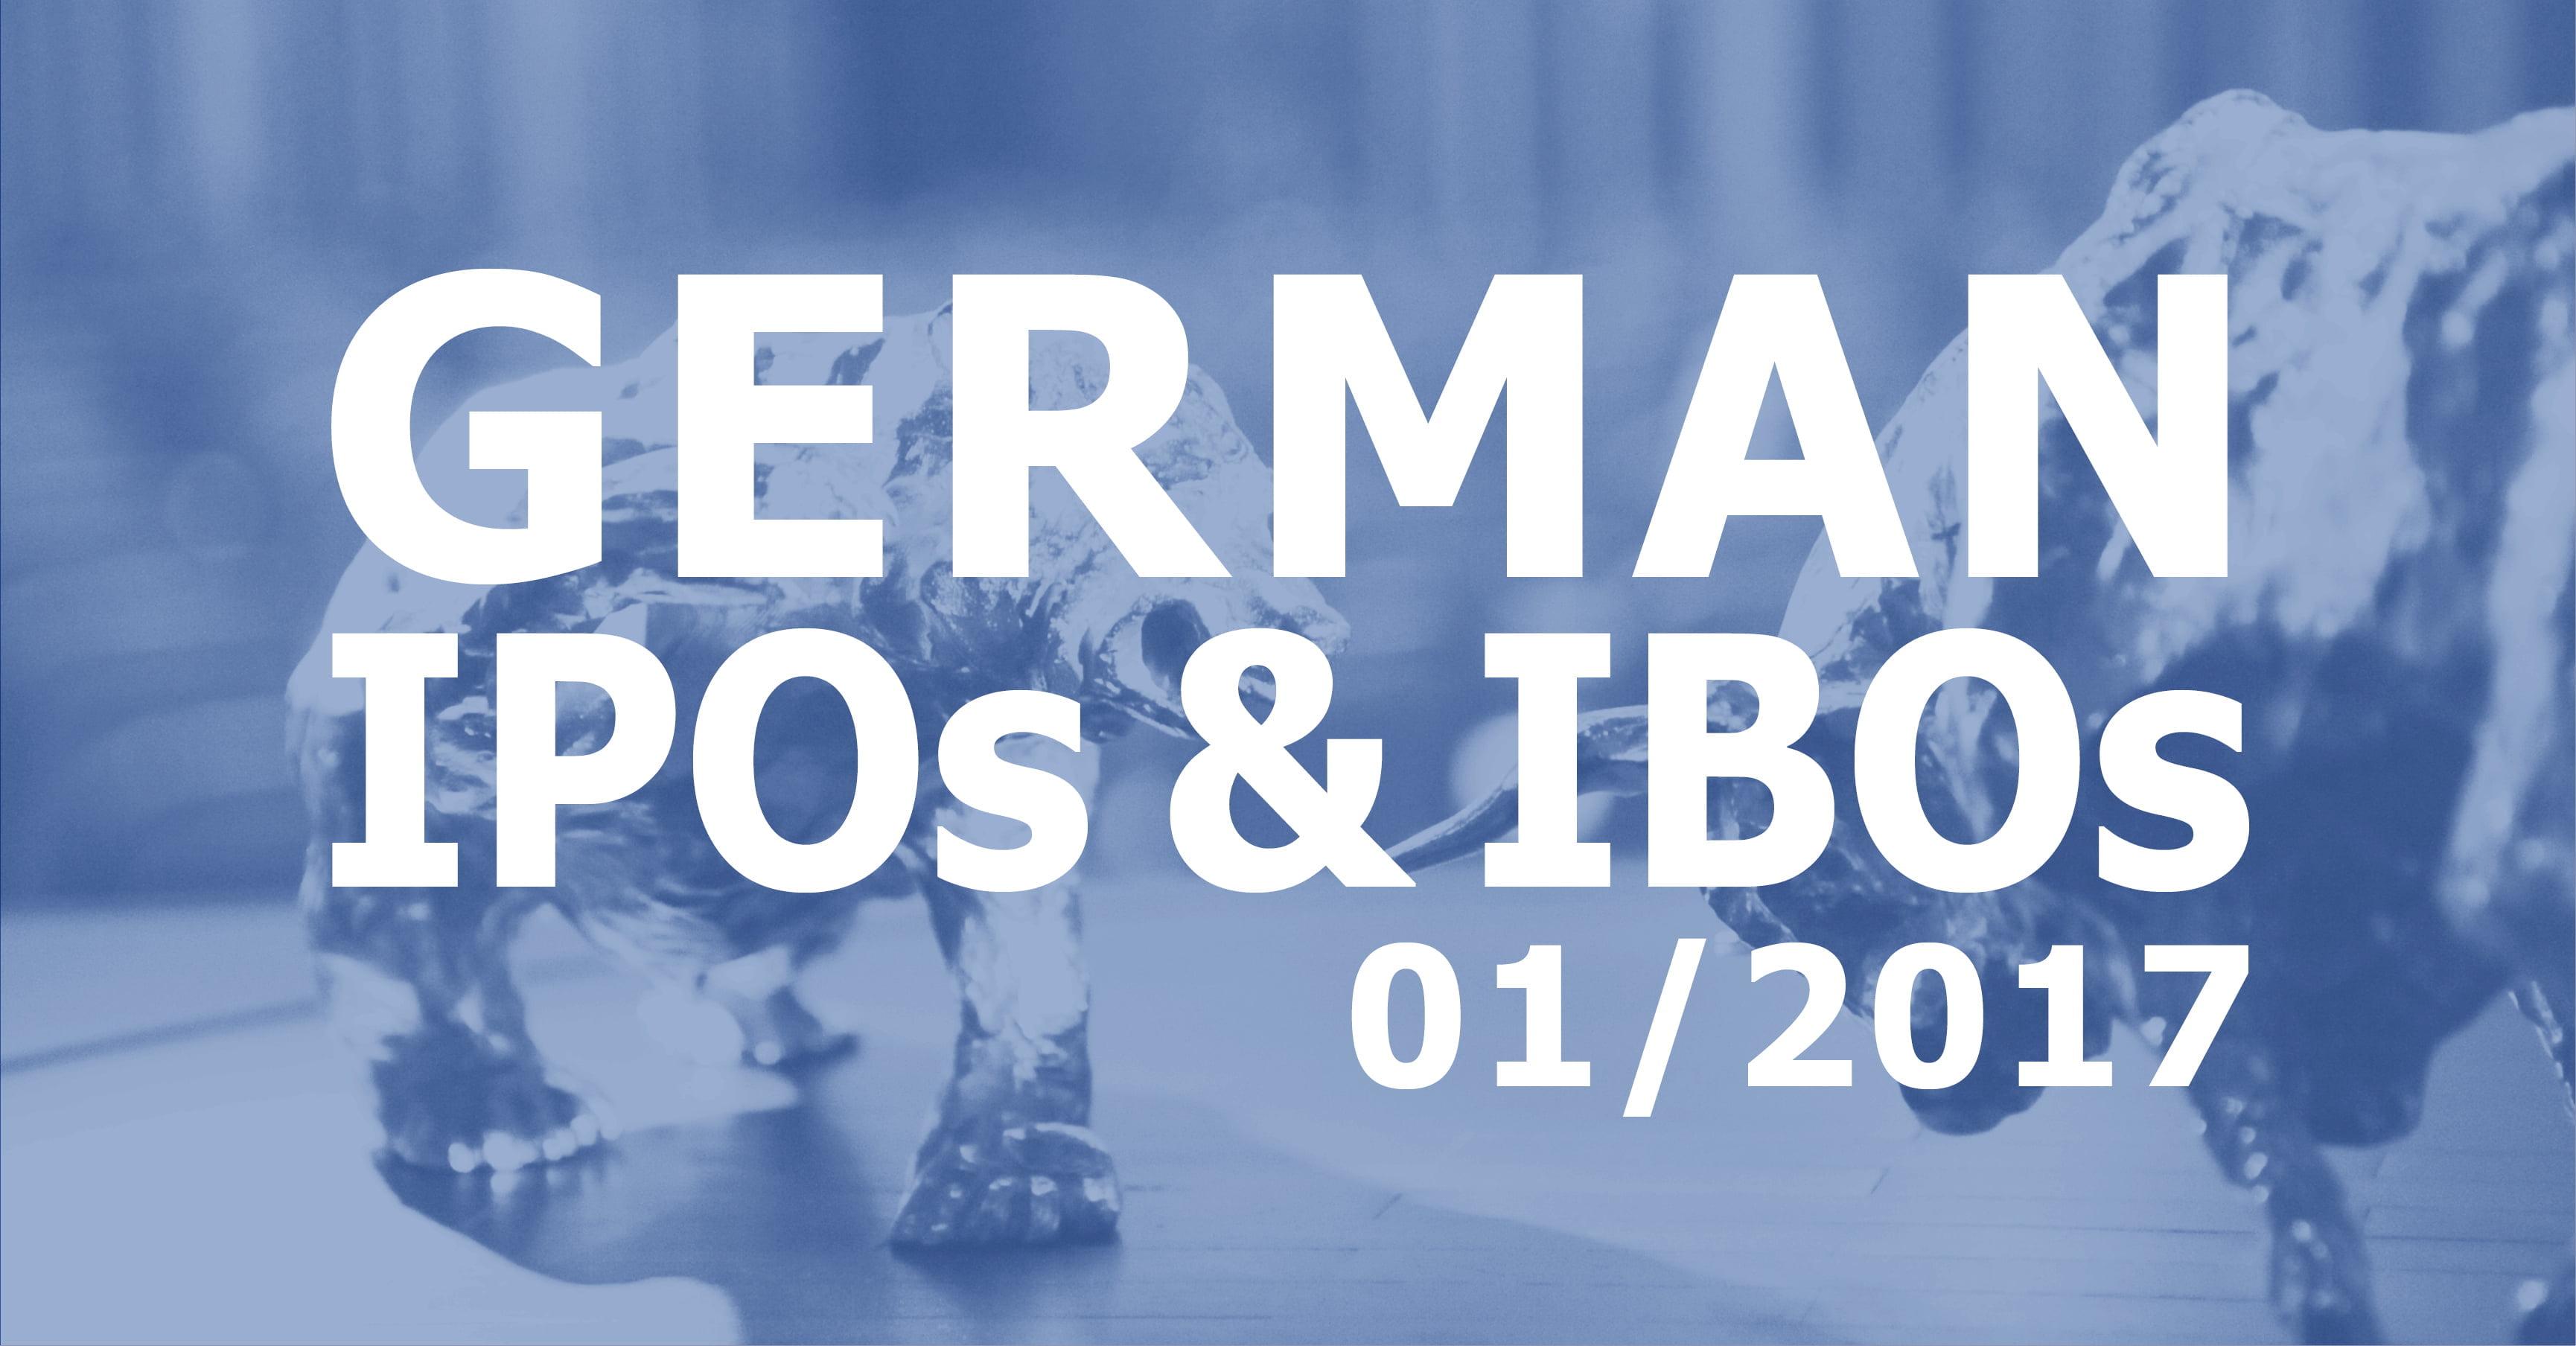 German IPOs and IBOs 01/2017